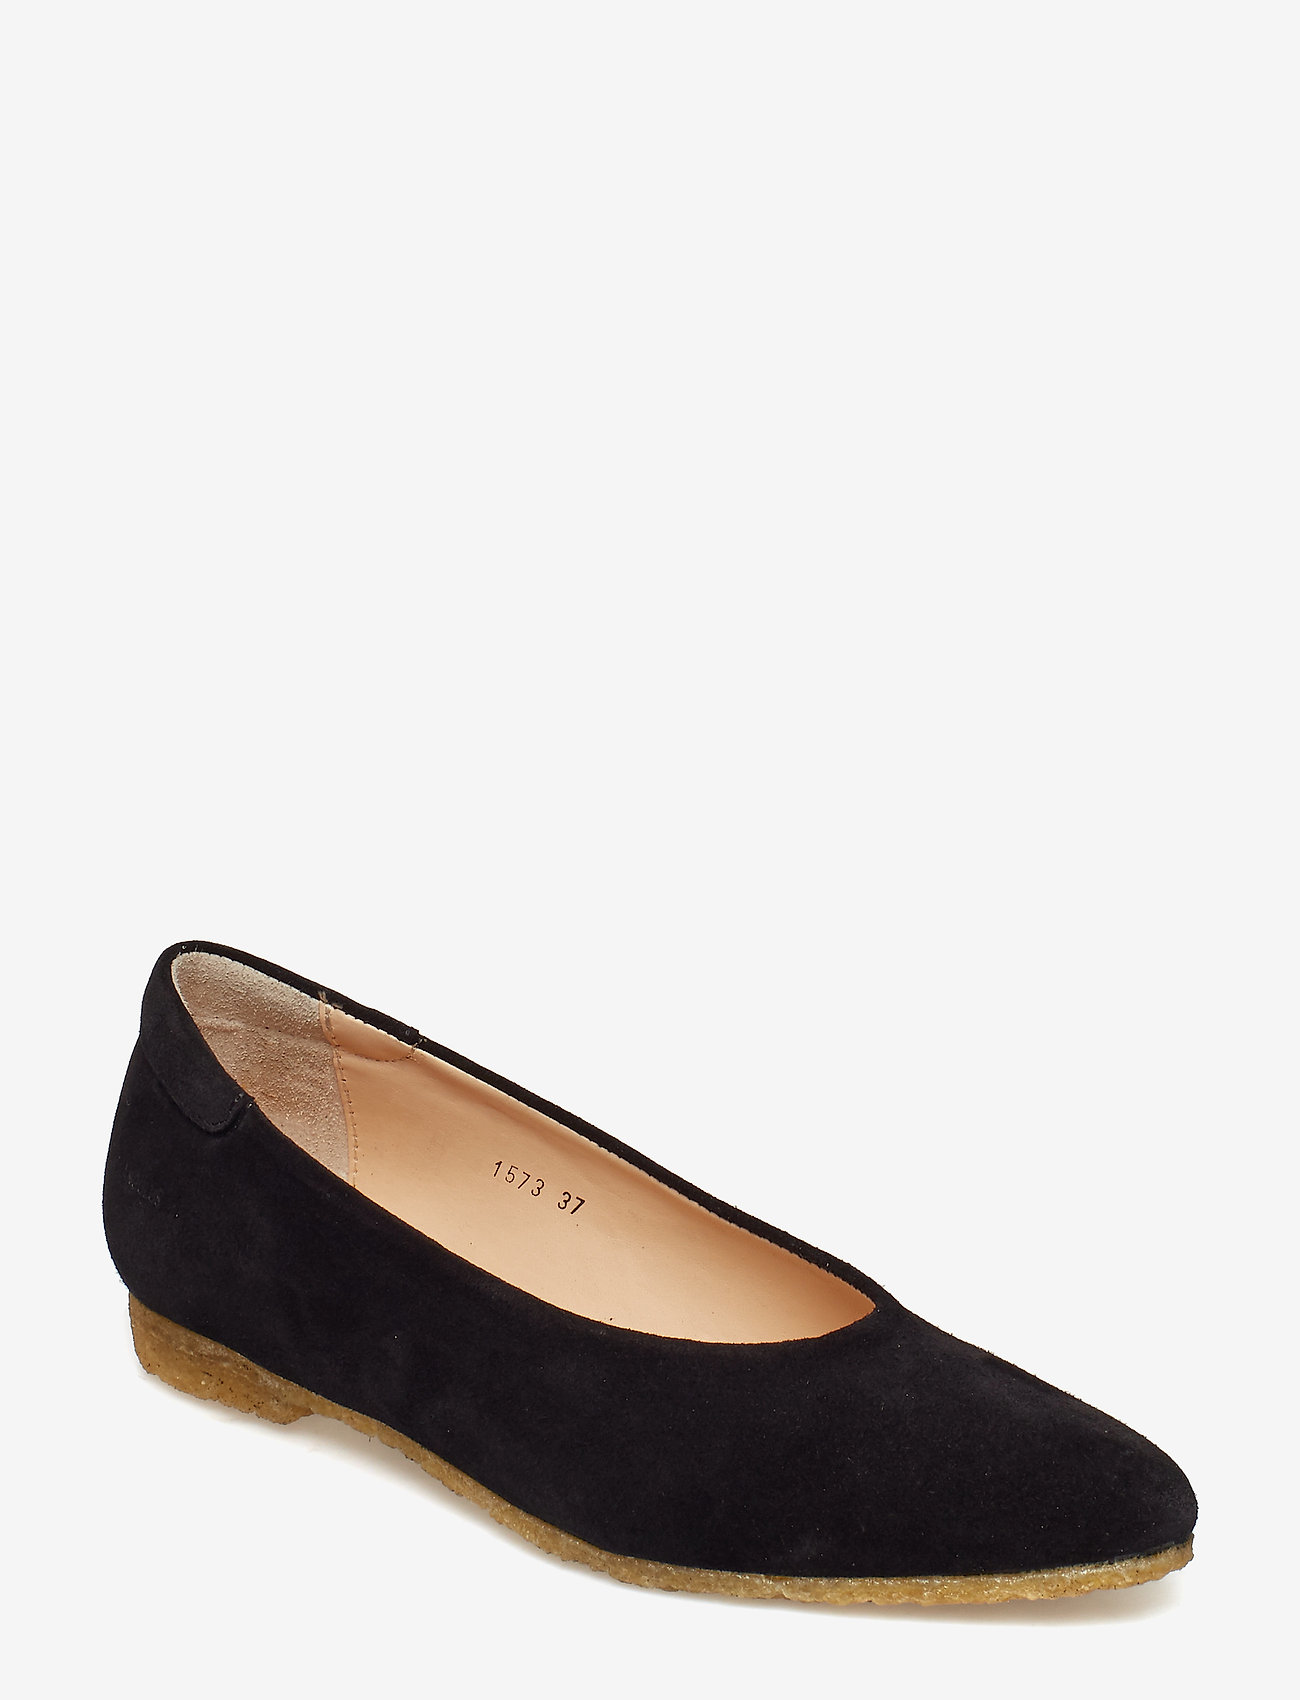 ANGULUS - Ballerina - ballerinas - 1163 black - 0